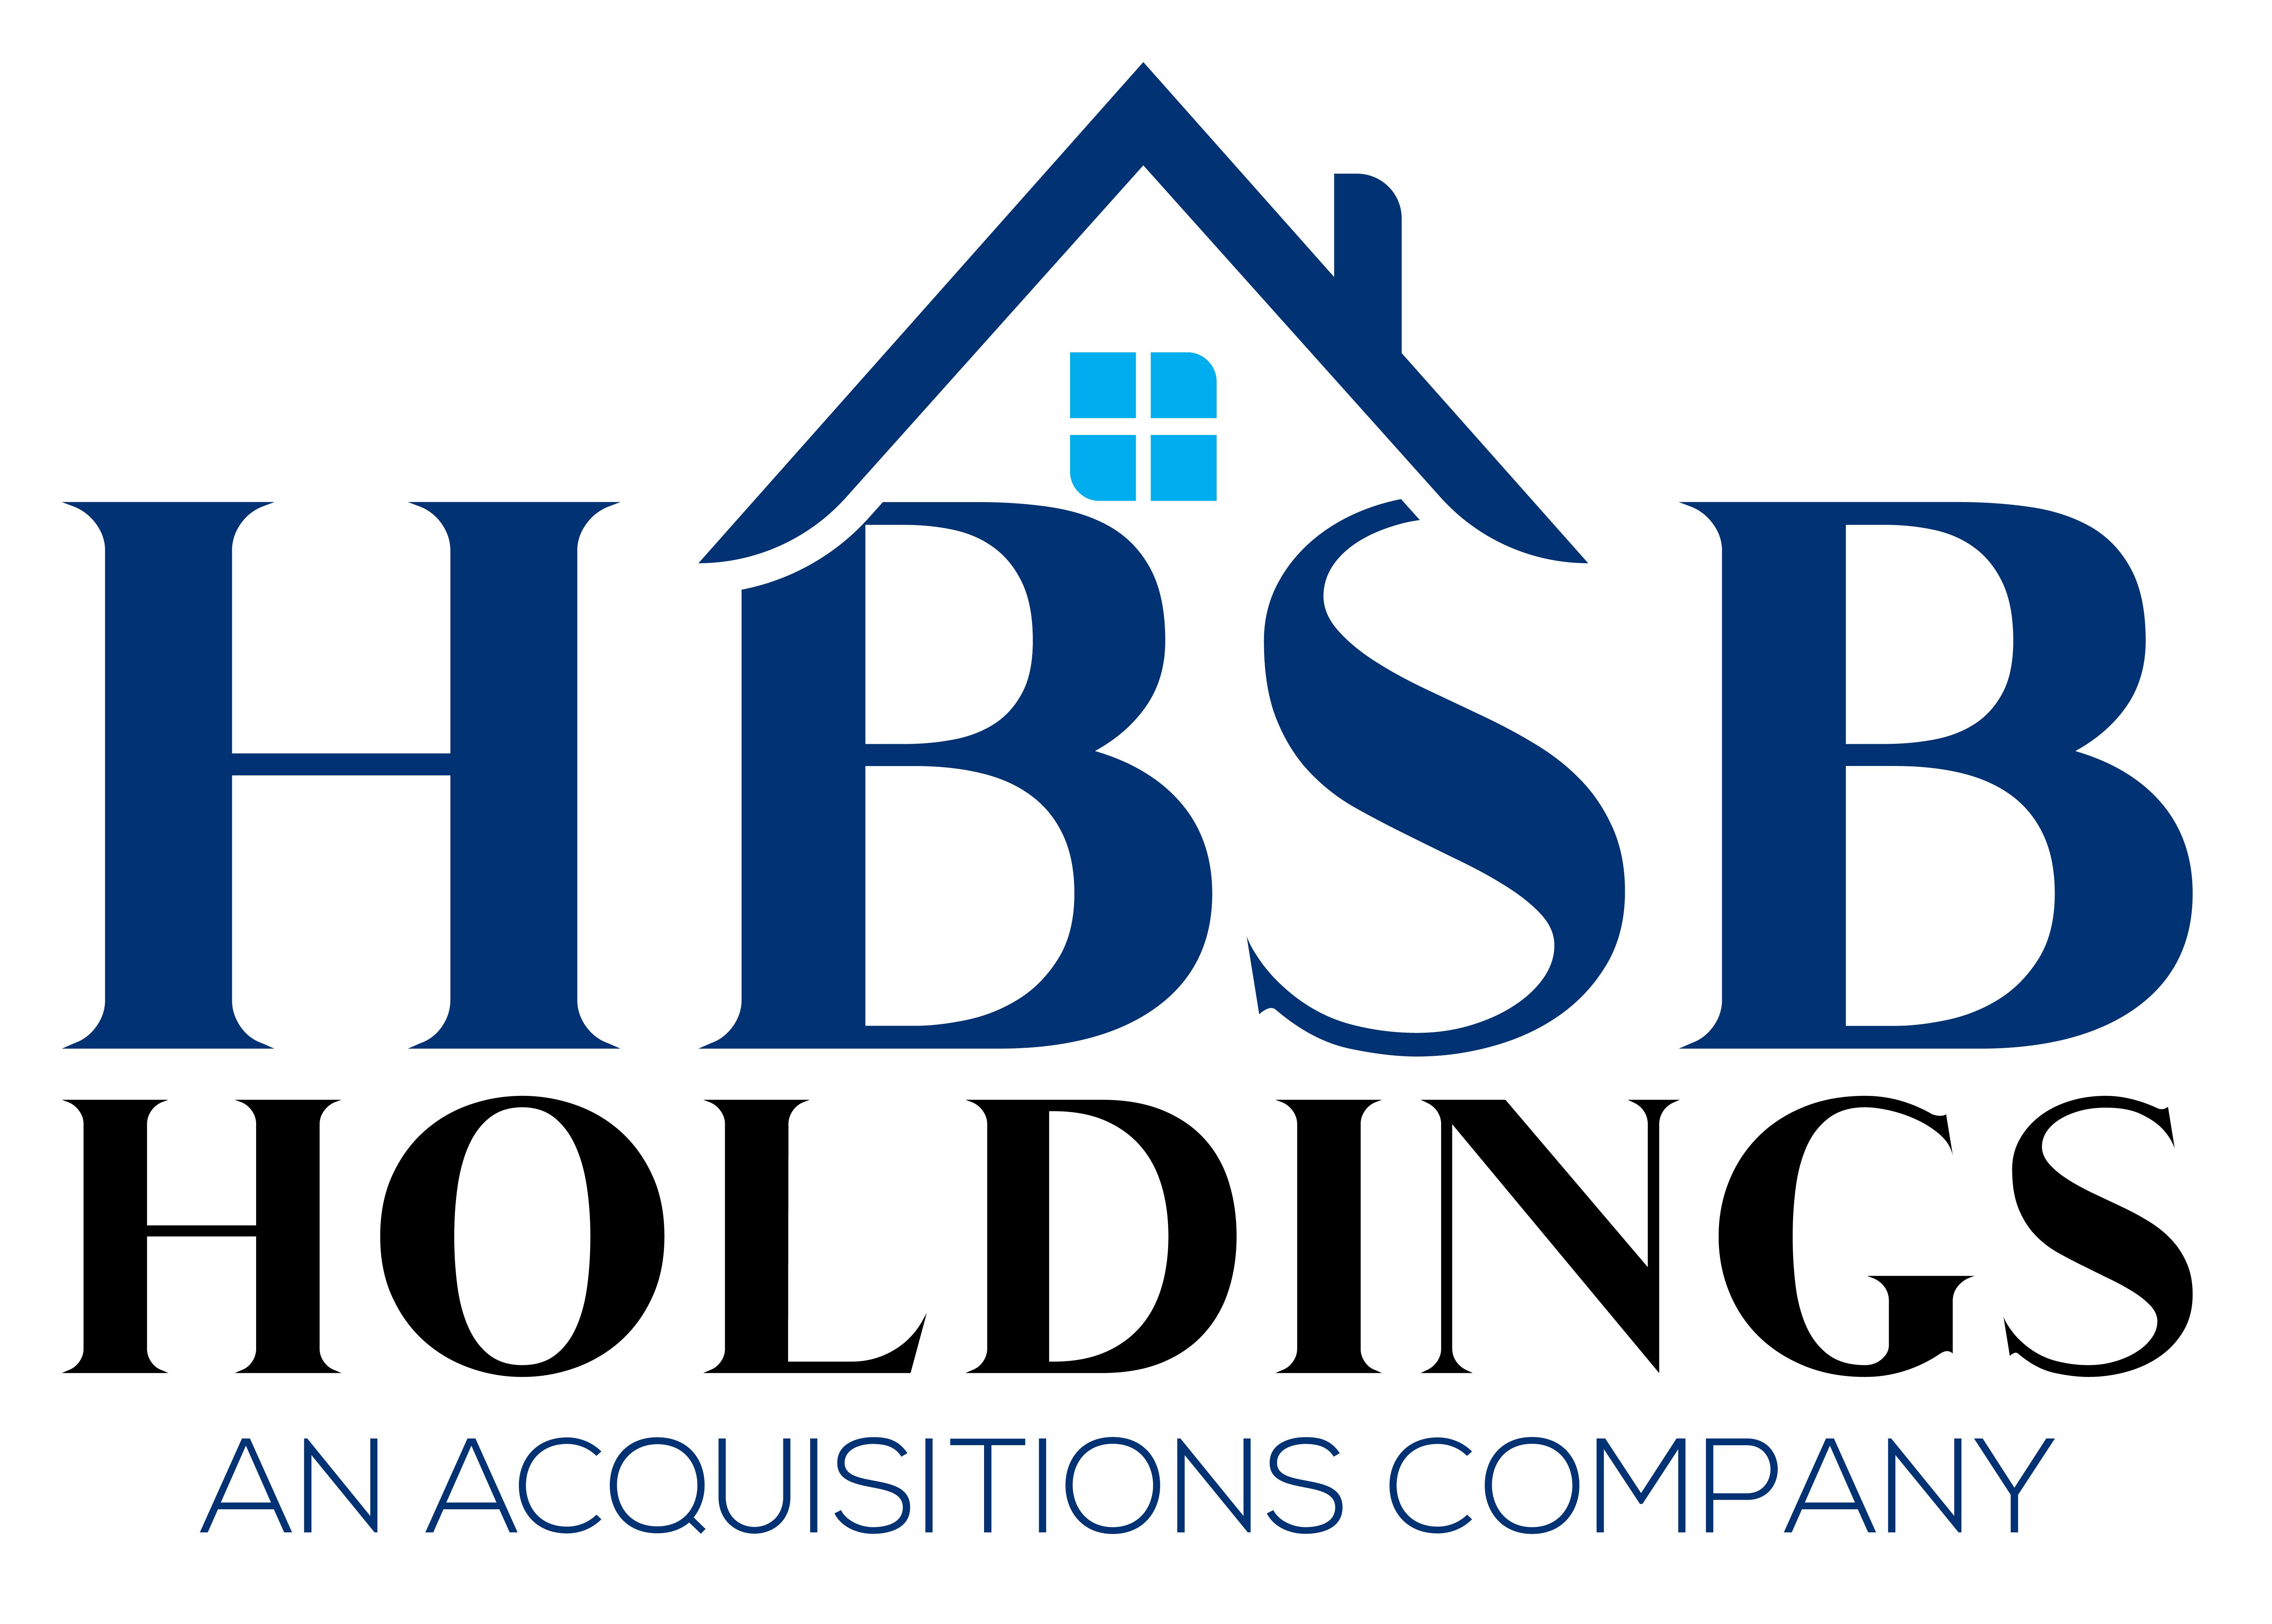 HBSB Holdings, LLC Buys Homes For Cash in Phoenix, AZ